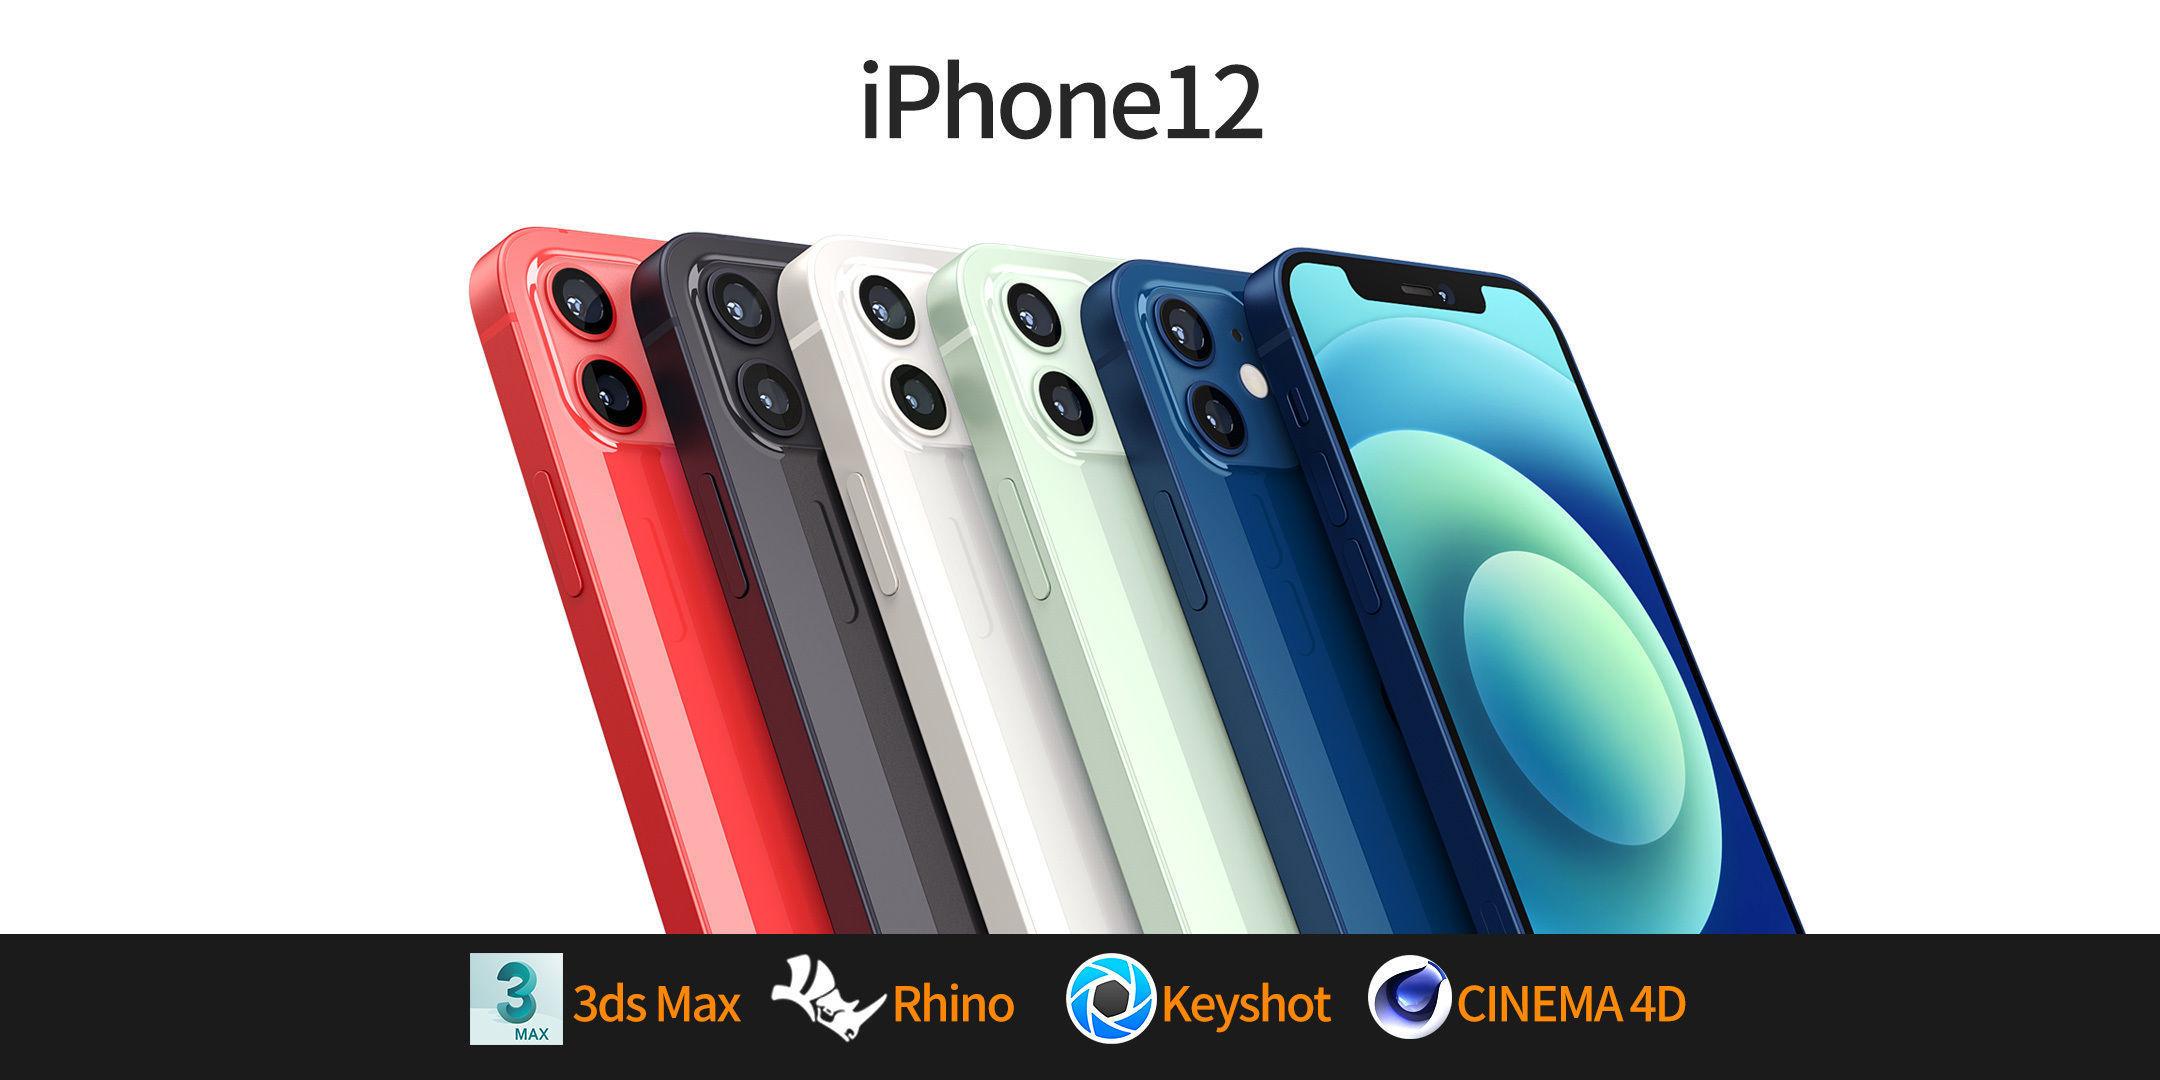 Apple iphone 12 mobile phone 3D model 3D model 3D model